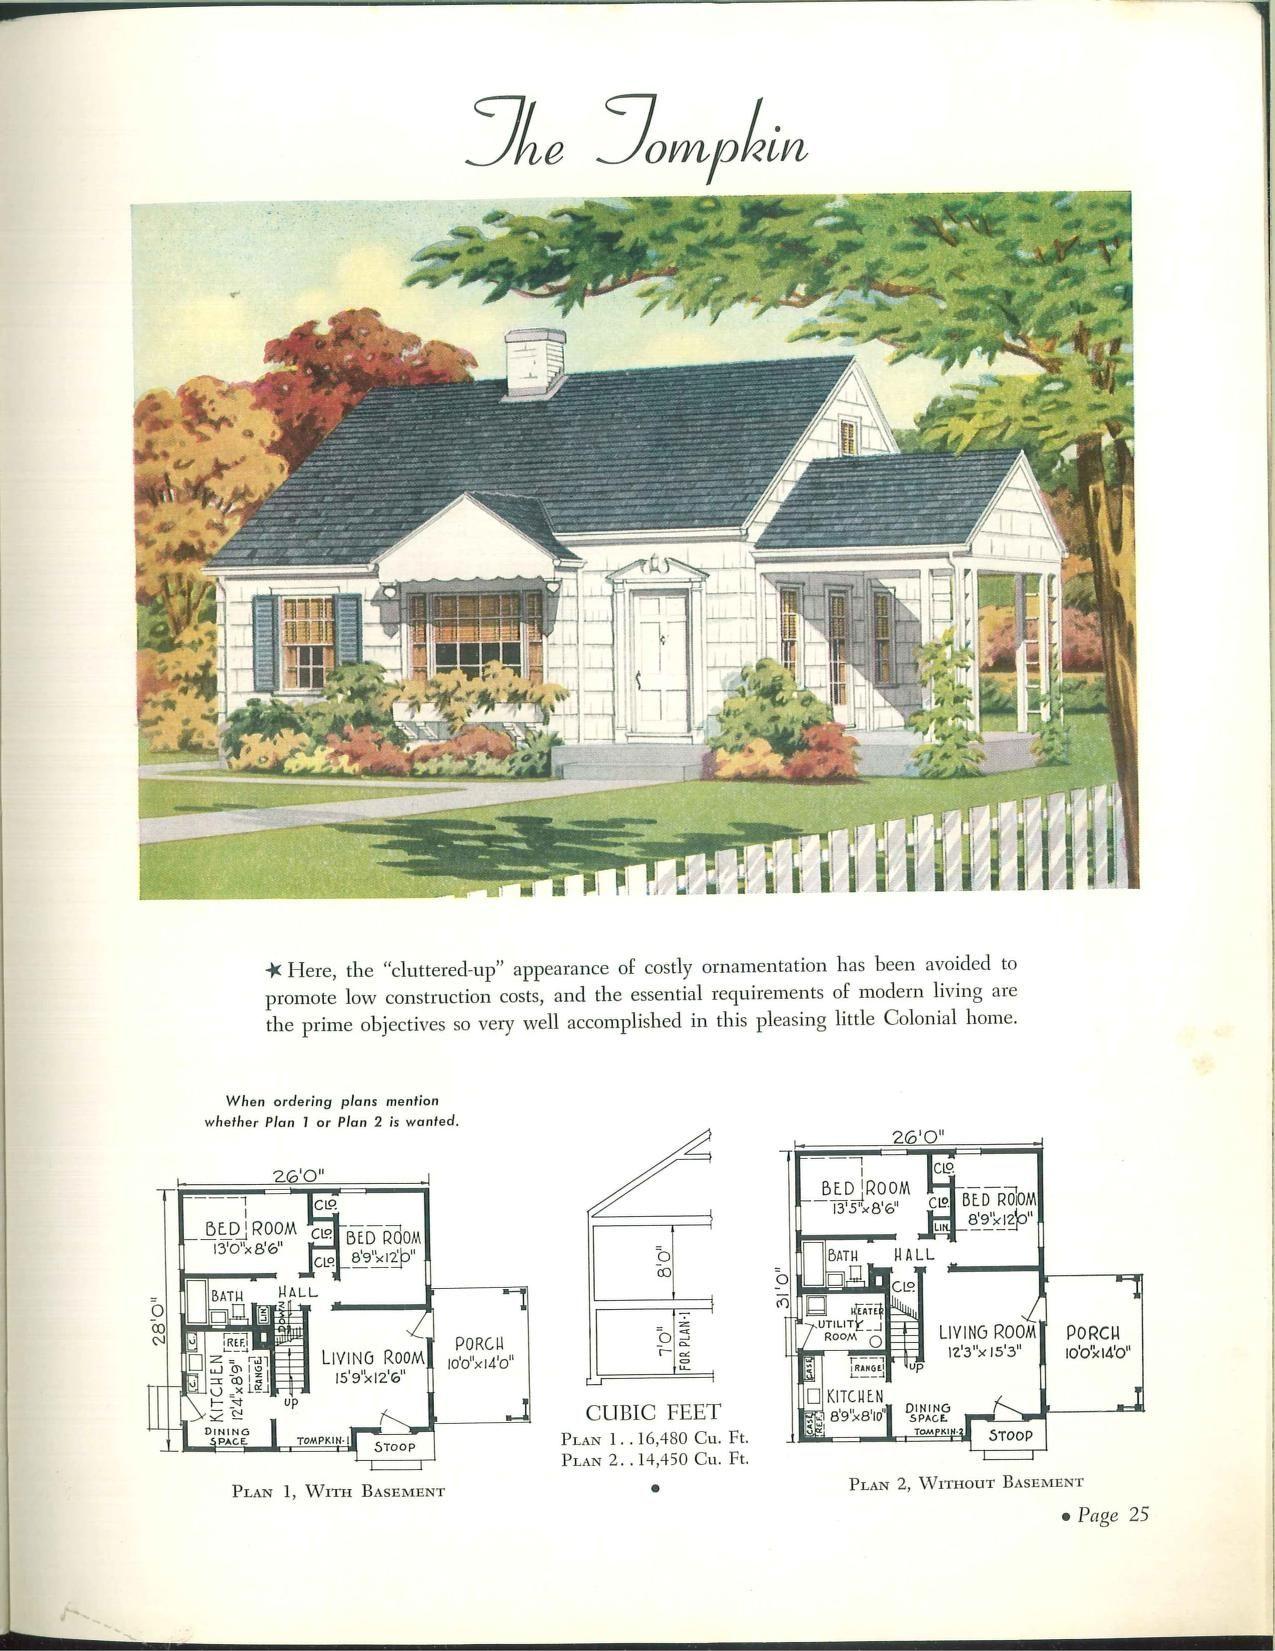 Wahlfeld 1942 Vintage House Architectural Prints